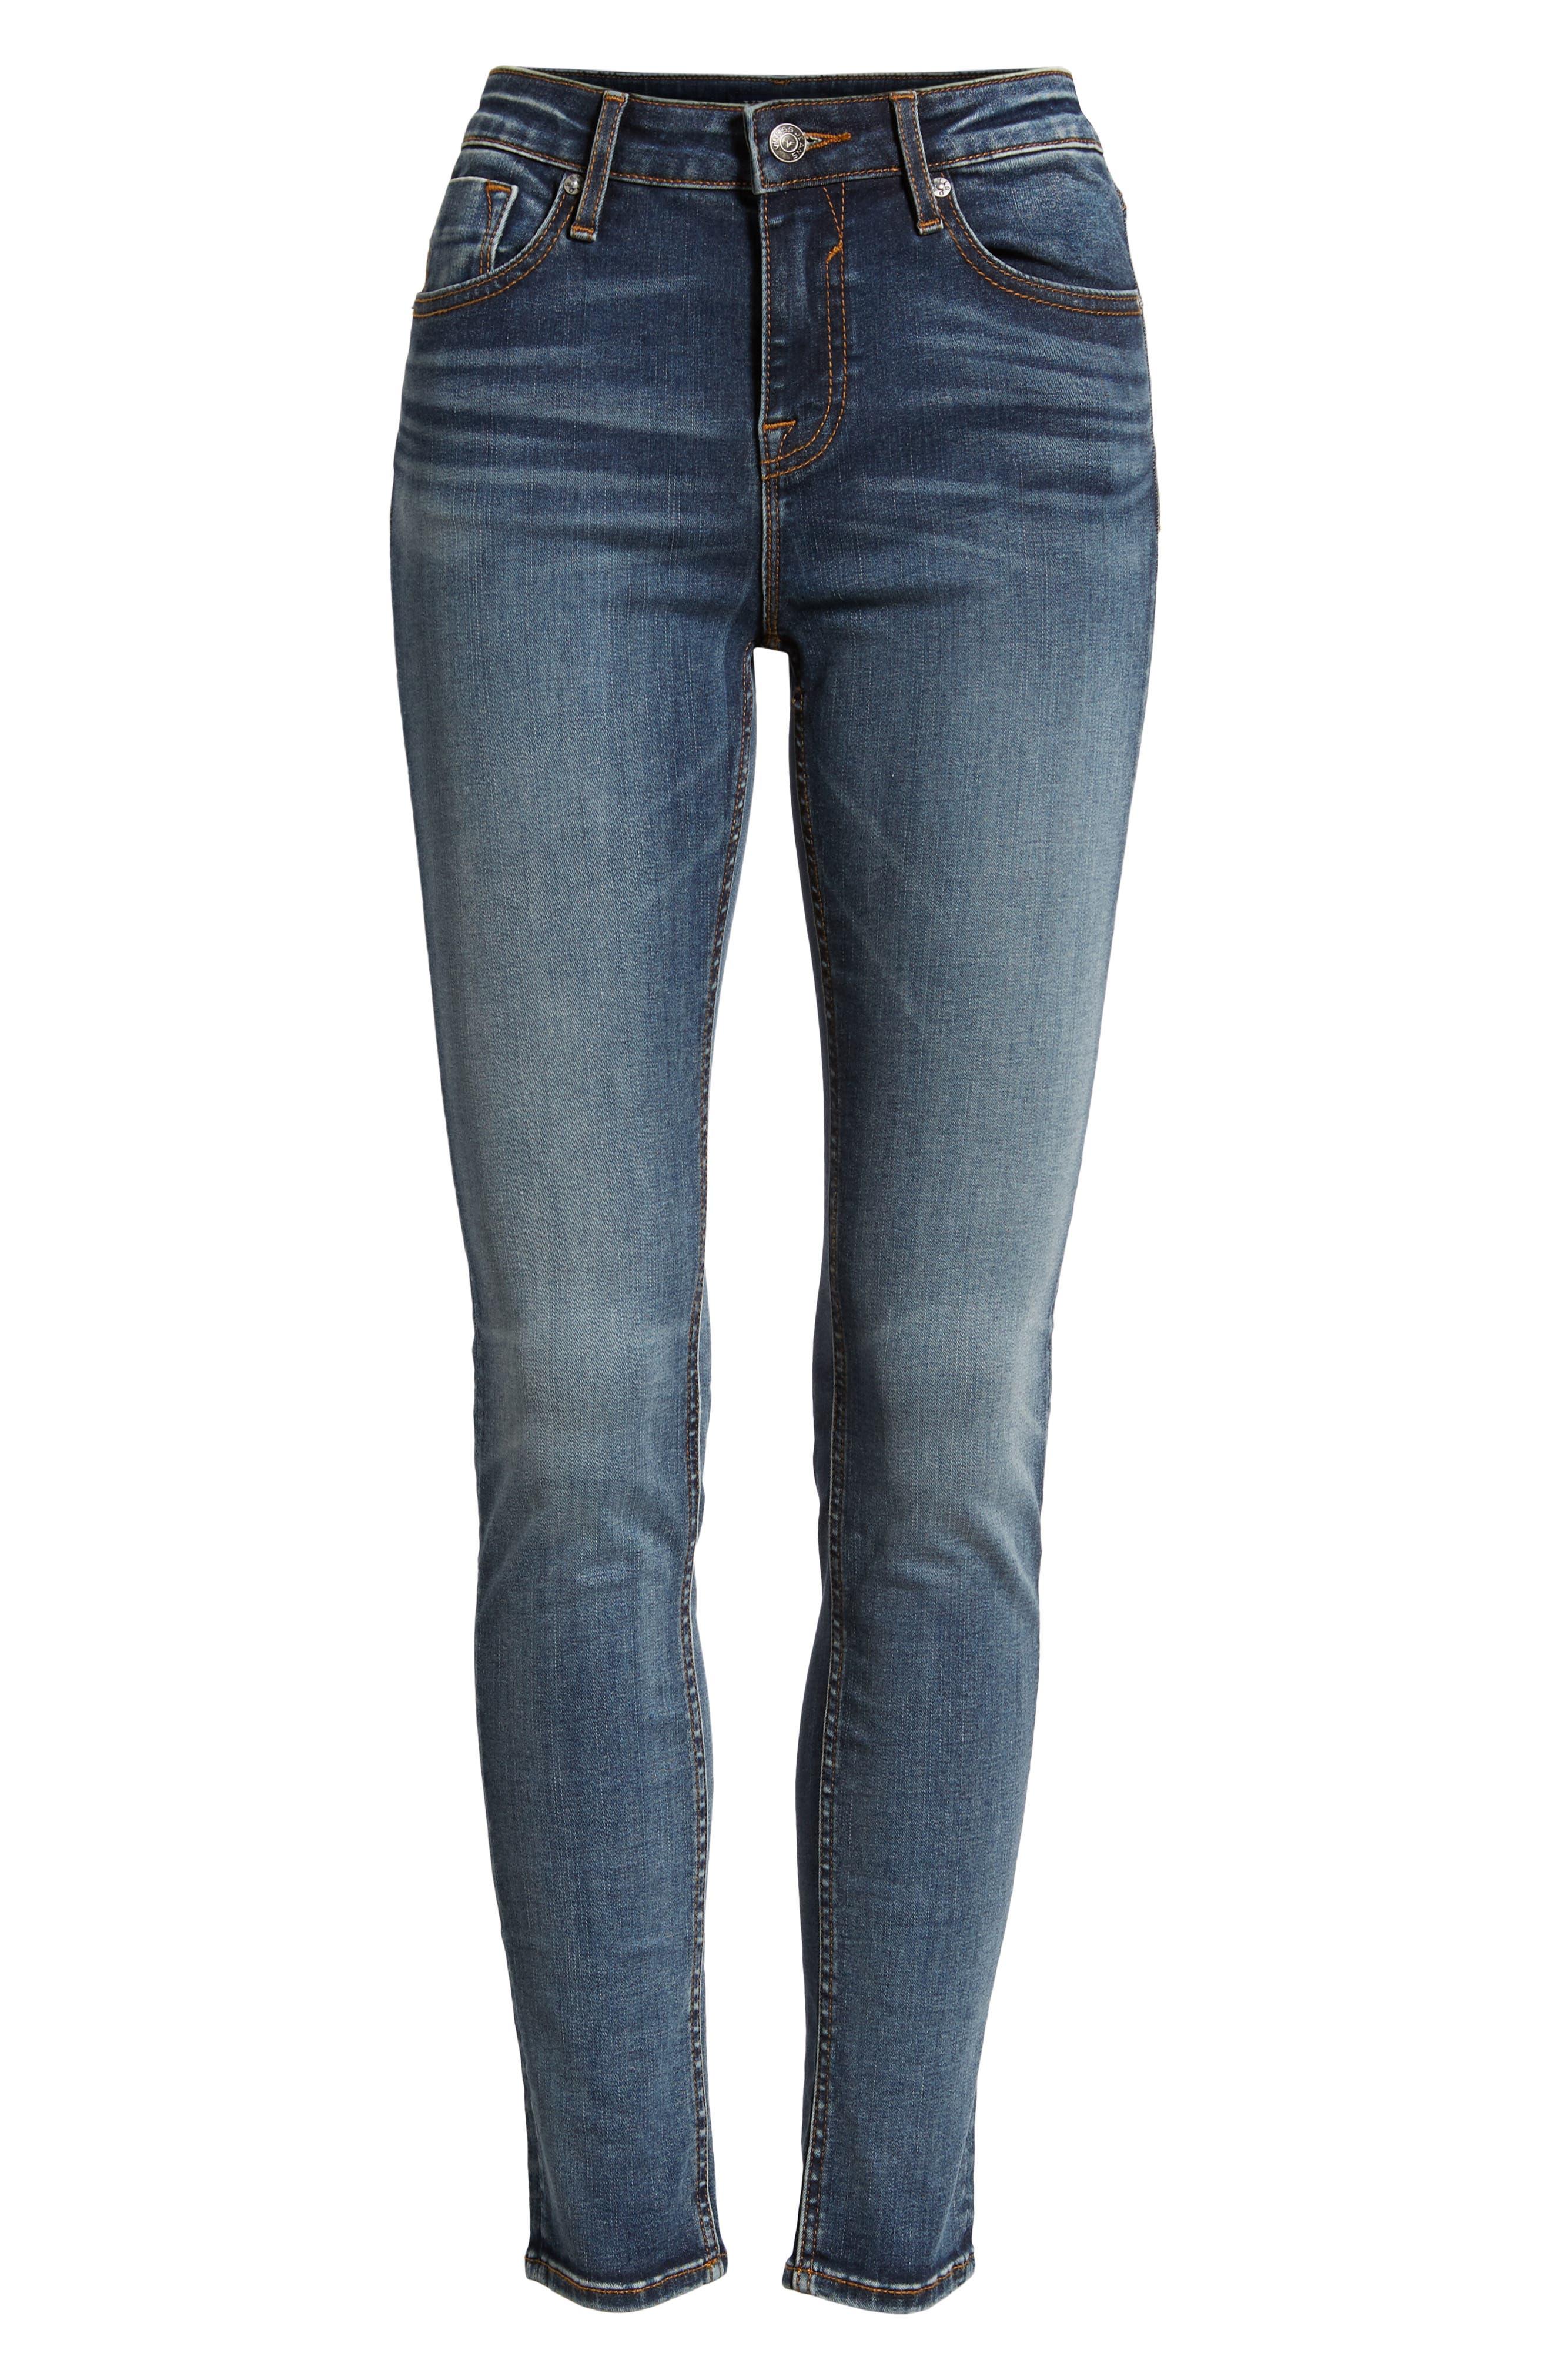 Marley Skinny Jeans,                             Alternate thumbnail 7, color,                             MED WASH